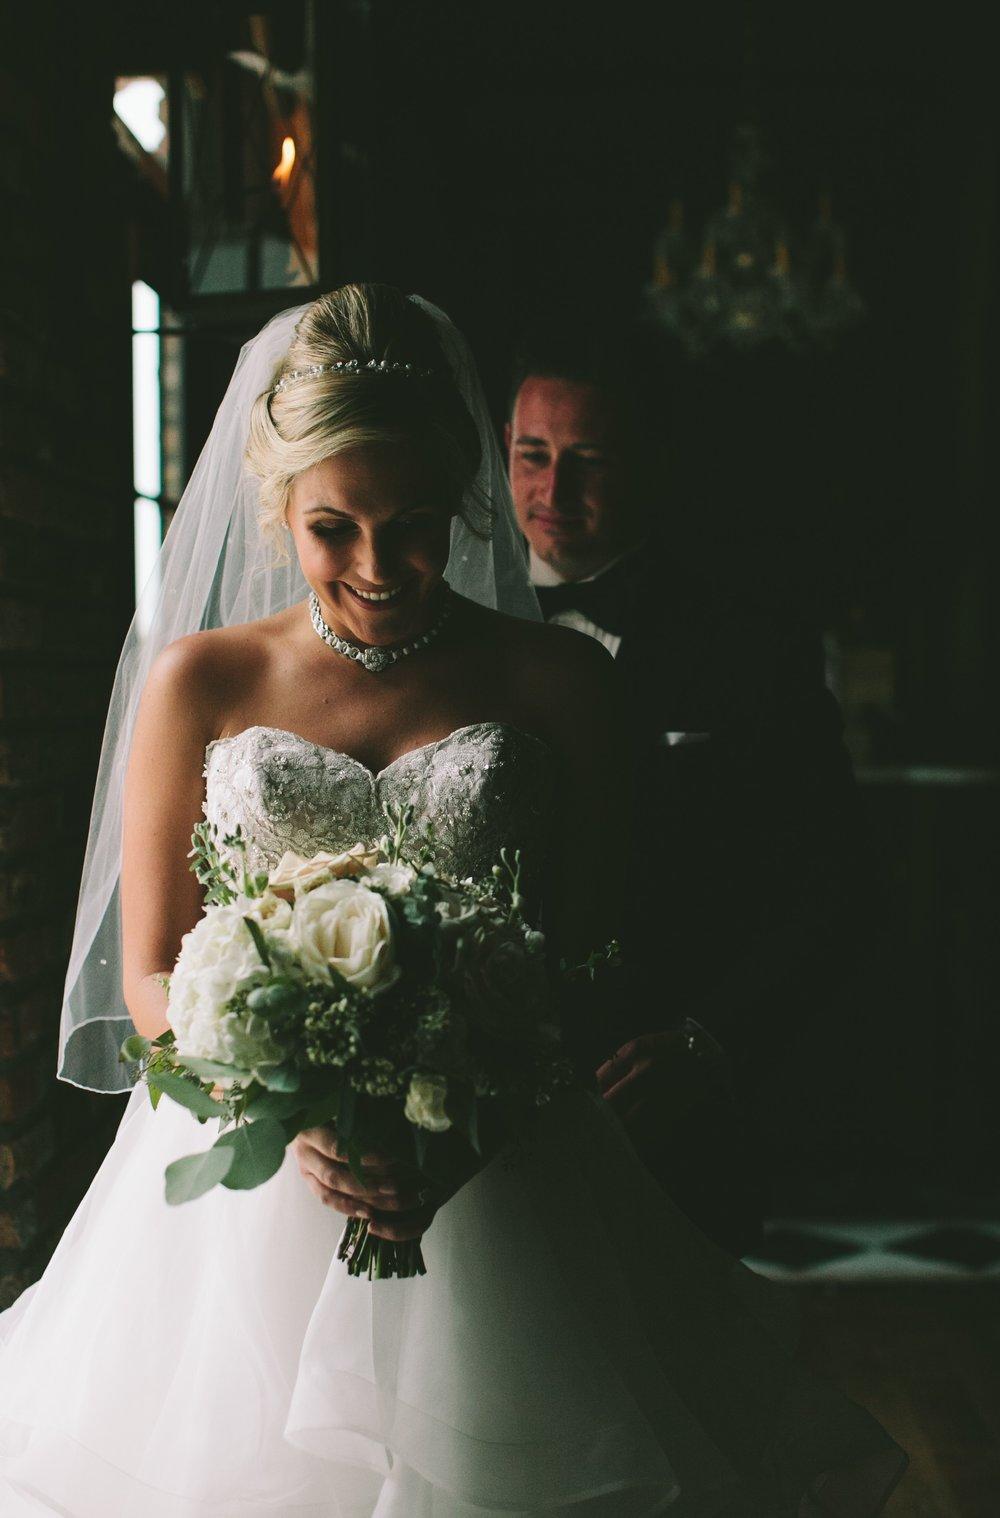 Katie + Dan Wedding at the Cruz Building Miami48.jpg